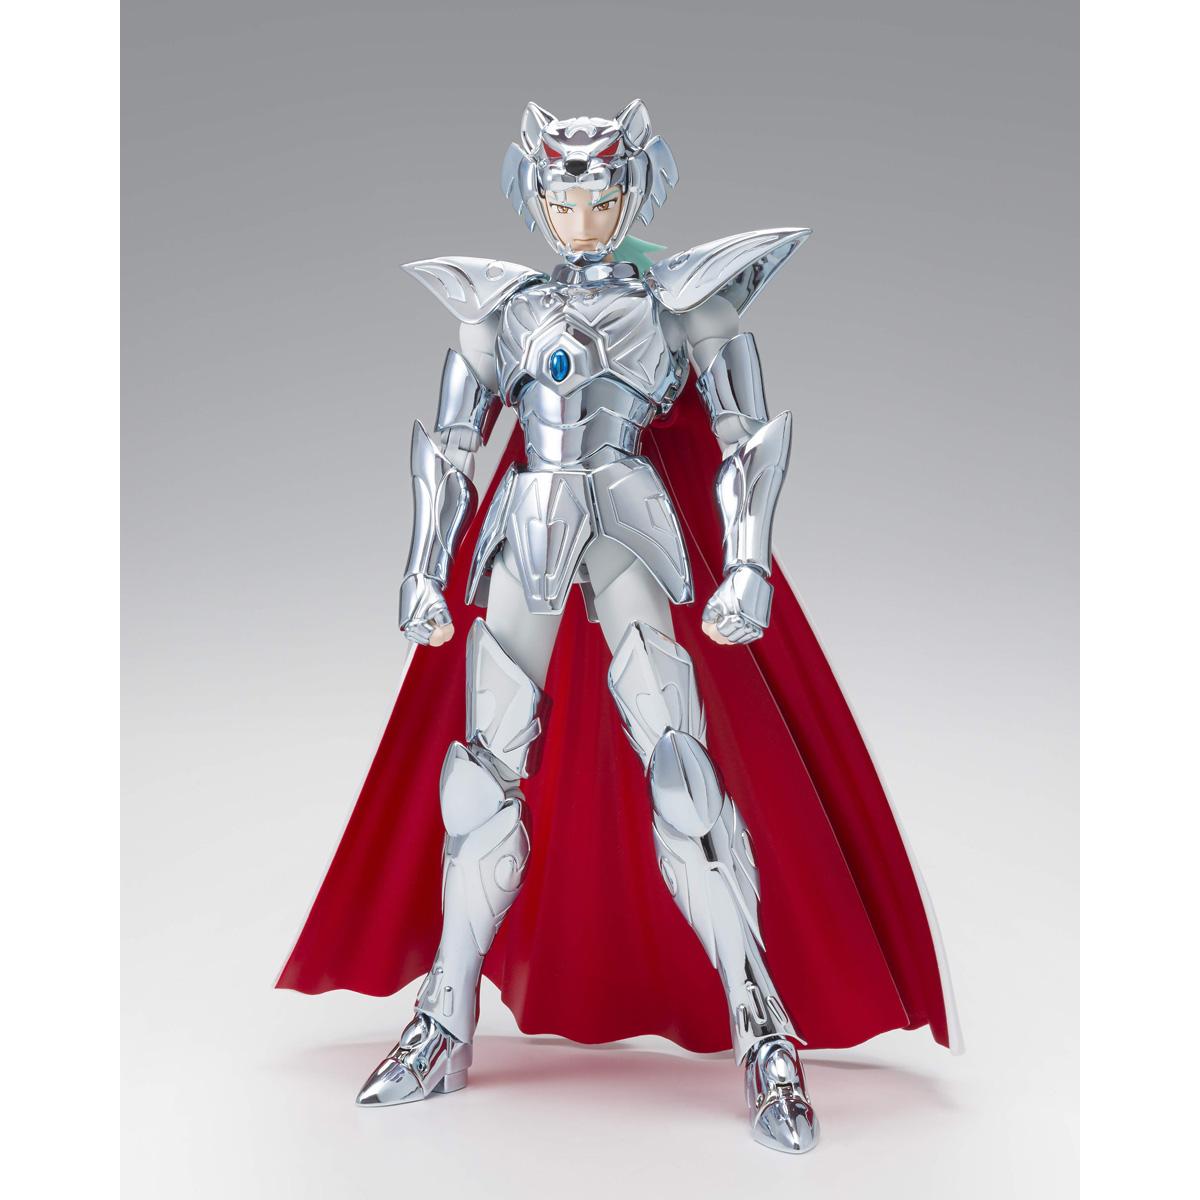 Figurine Saint Seiya Myth Cloth EX Zeta Alcor Bud 18cm